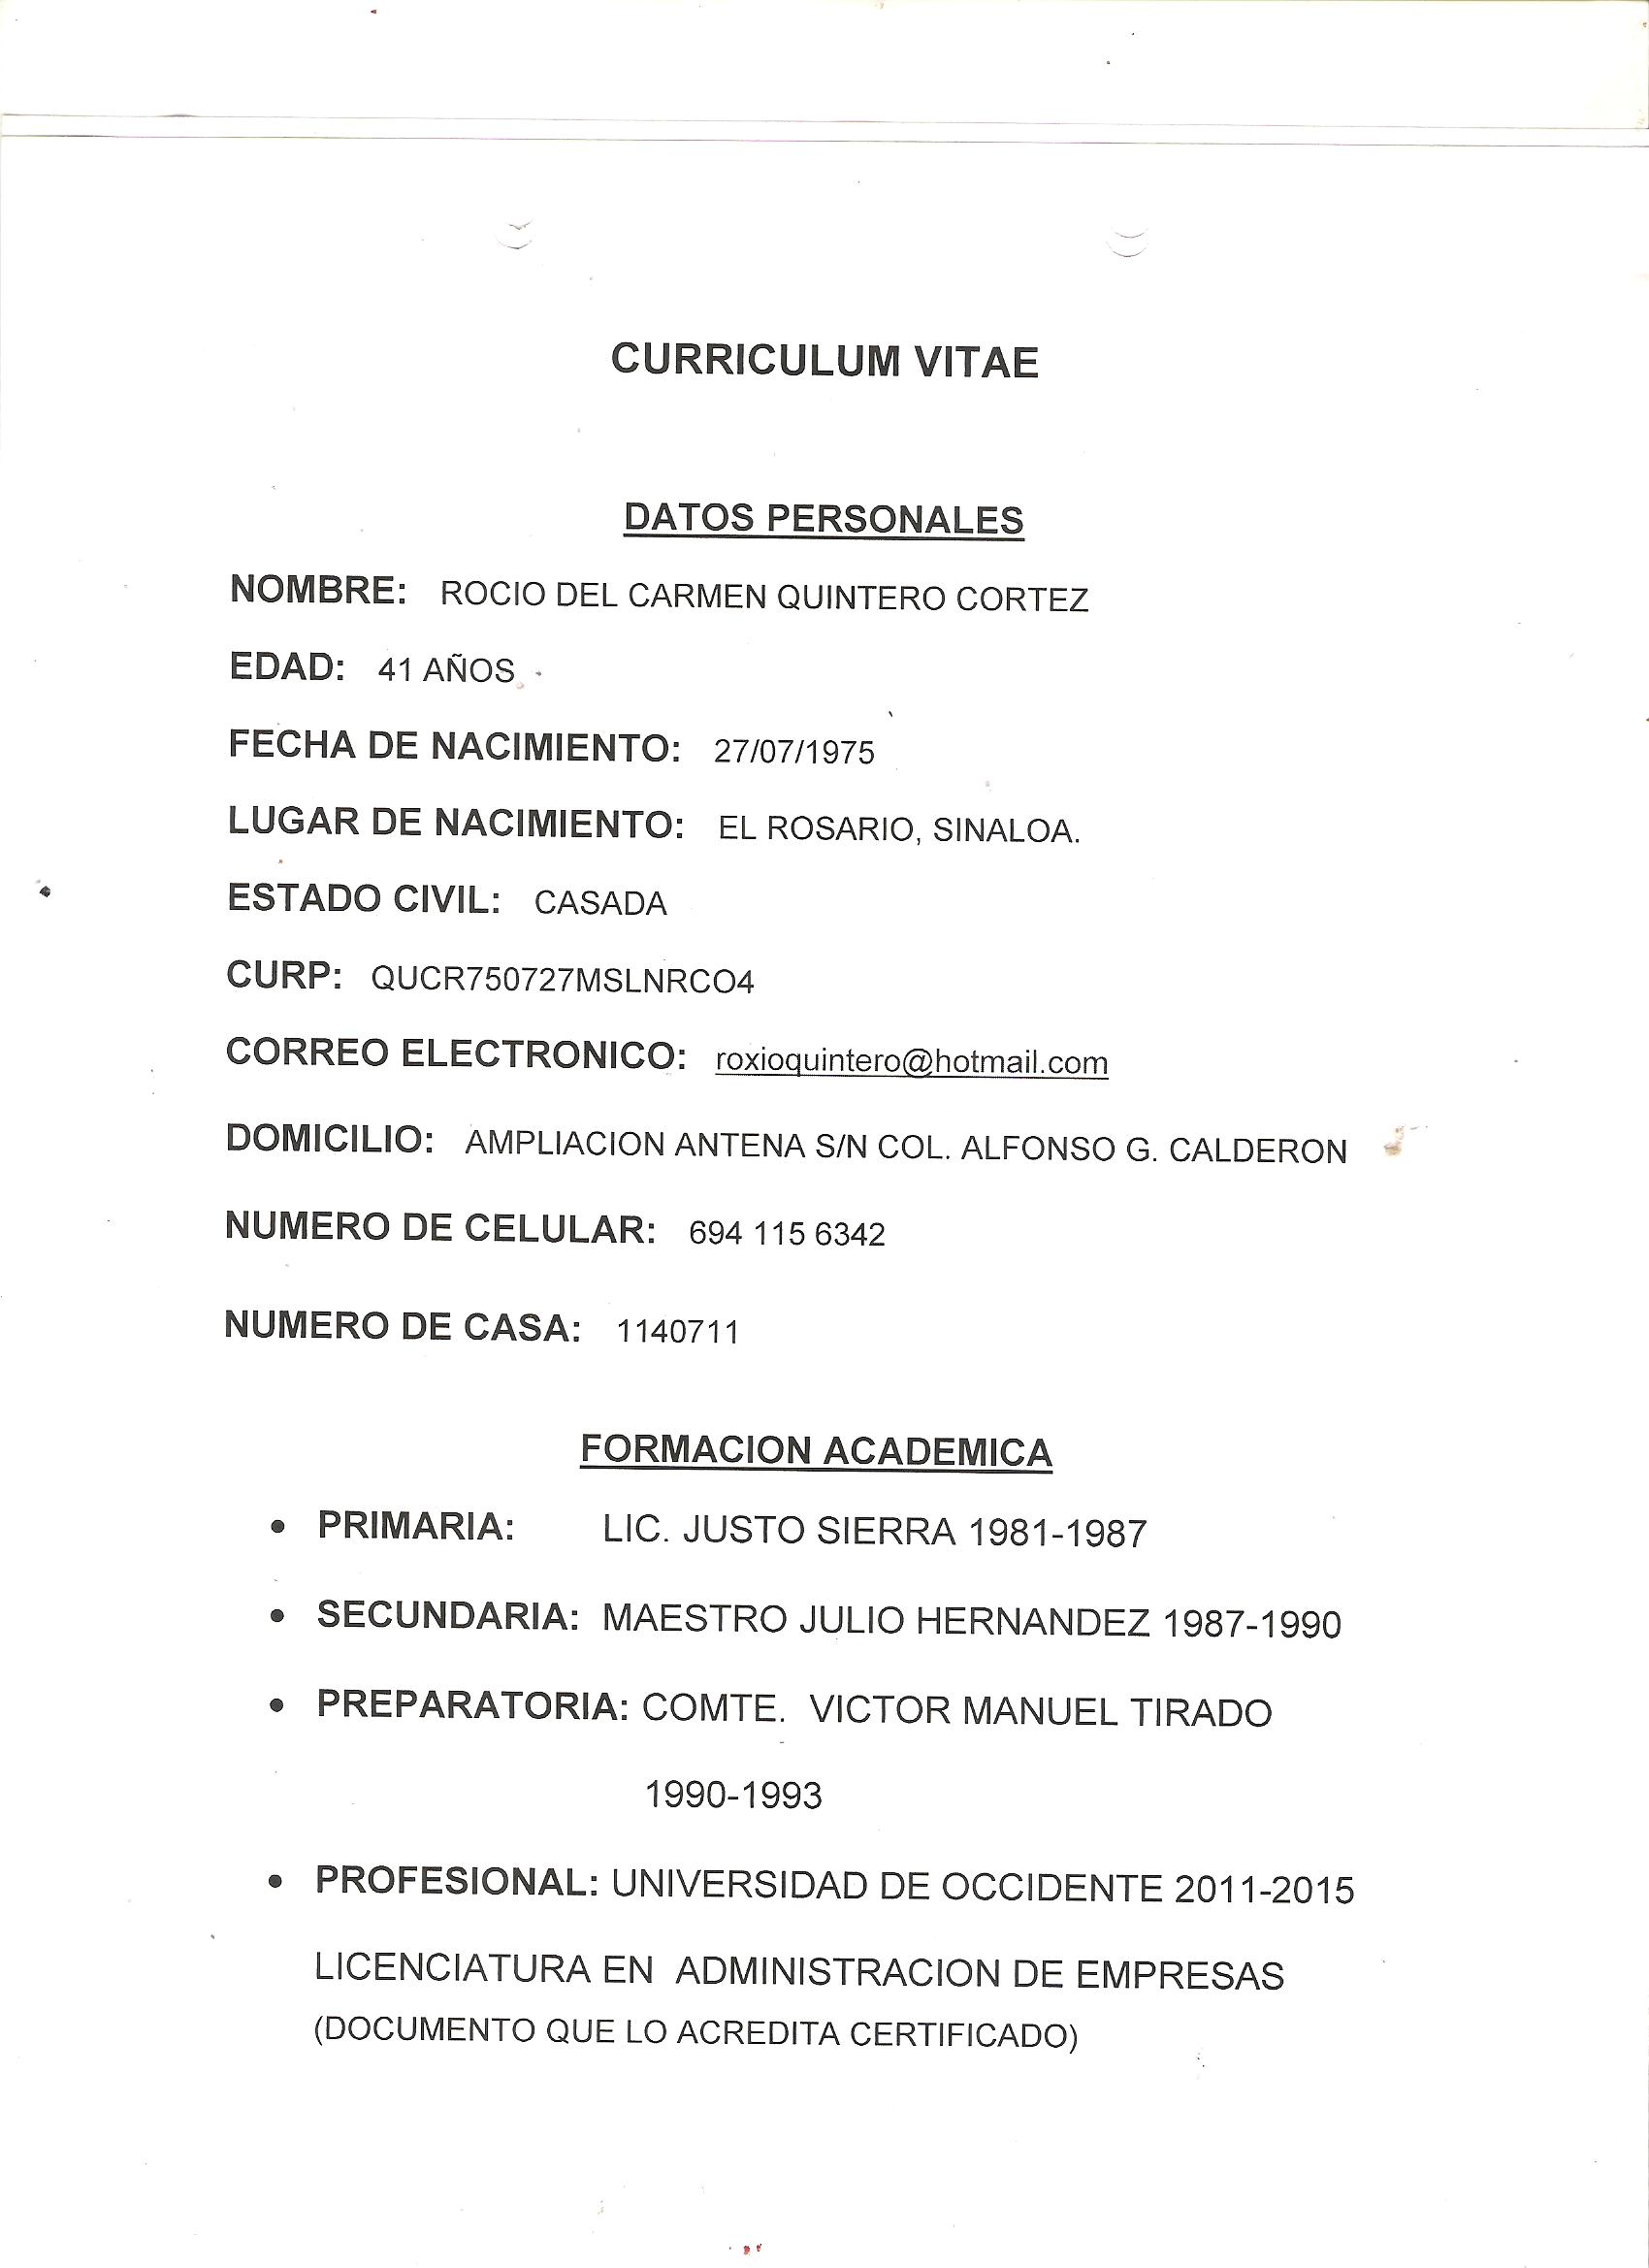 Excelente Analista De Negocios Curriculum Vitae Archivo Tipo ...